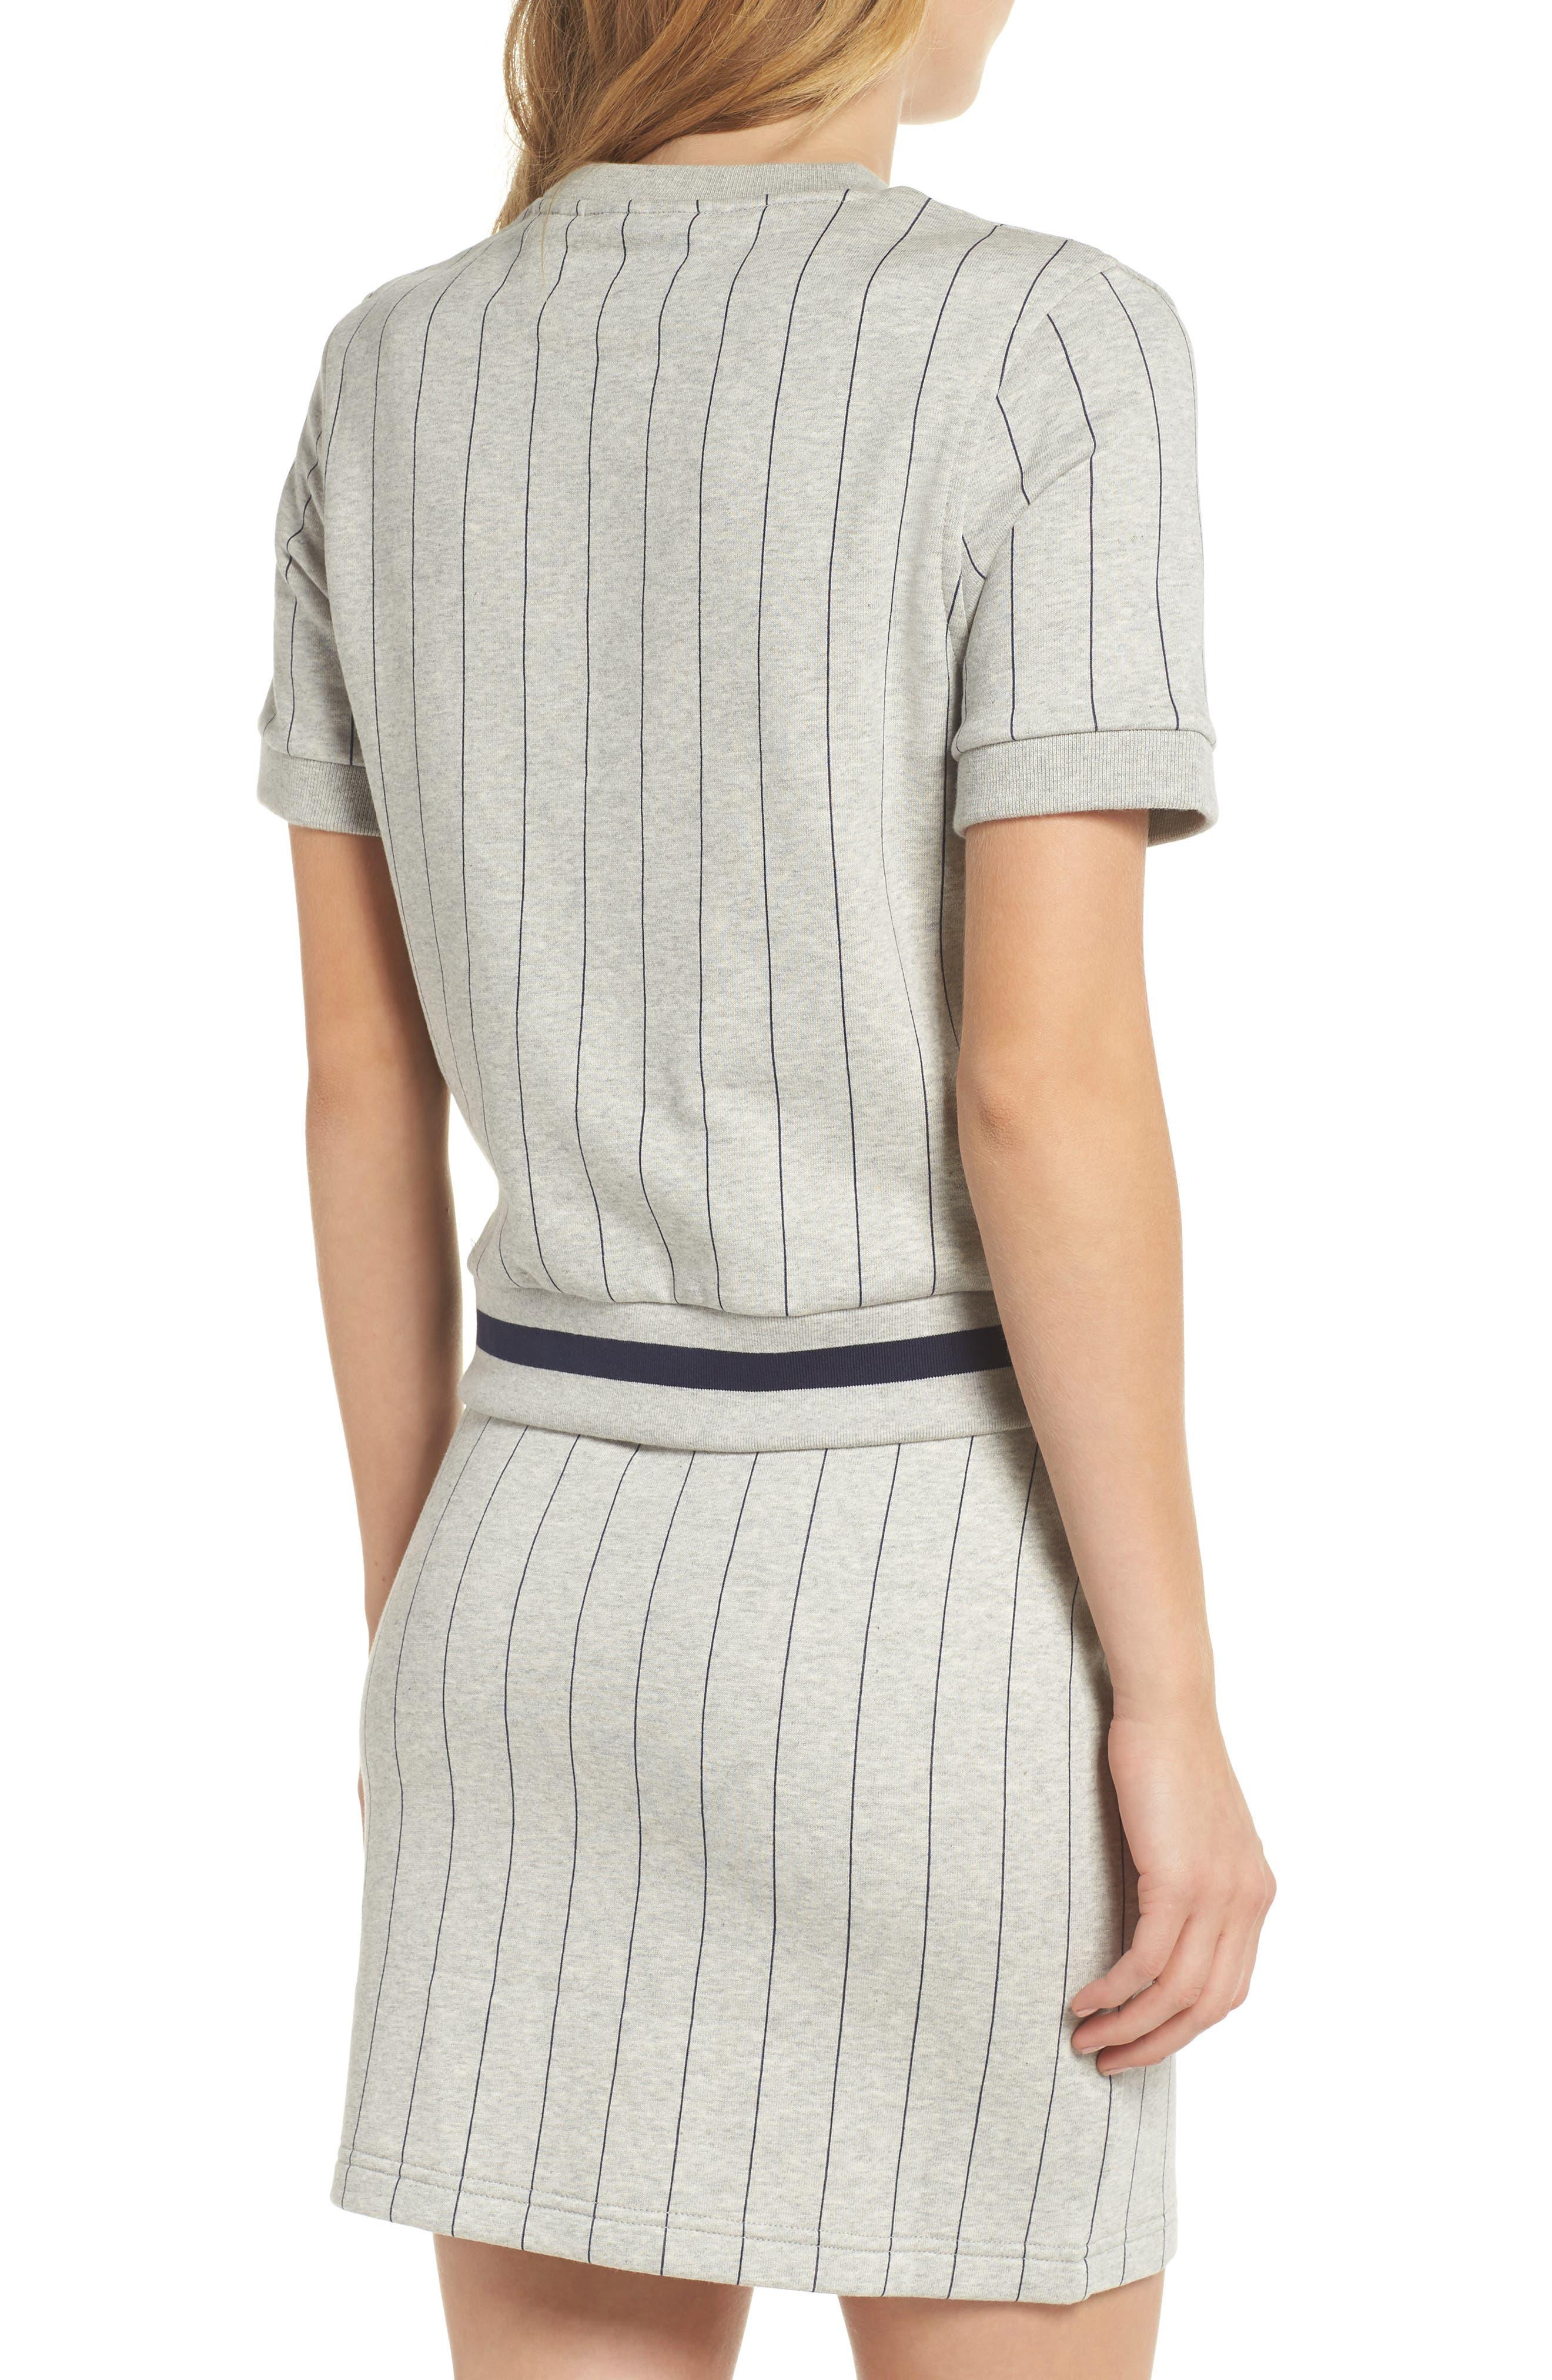 Bren Stripe Sweatshirt,                             Alternate thumbnail 3, color,                             Light Grey Marl/ Peacoat